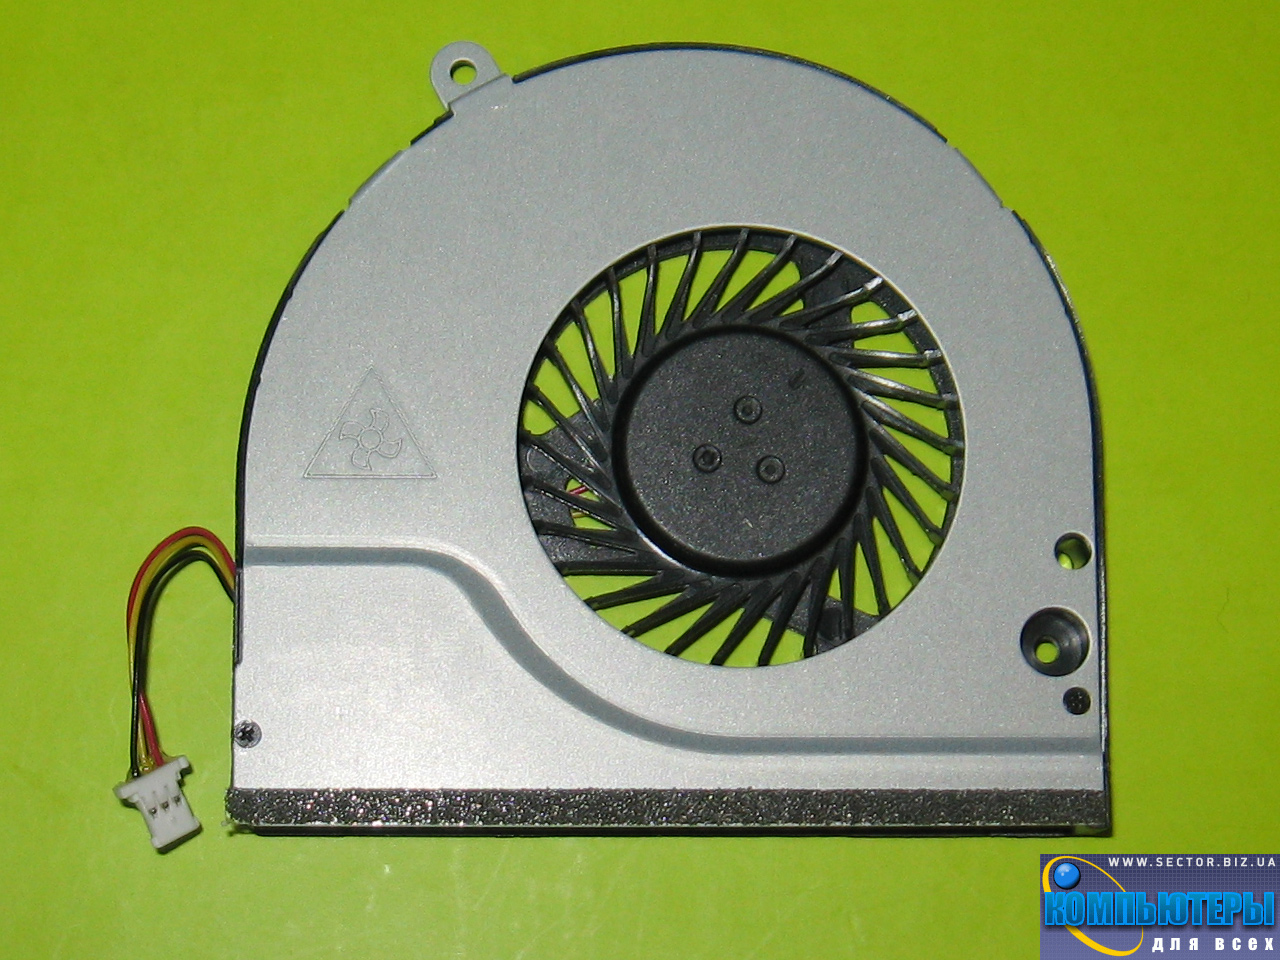 Кулер к ноутбуку Acer Aspire E1-530 E1-530G E1-570 E1-570G p/n: MF60070V1-C200-G99. Фото № 2.